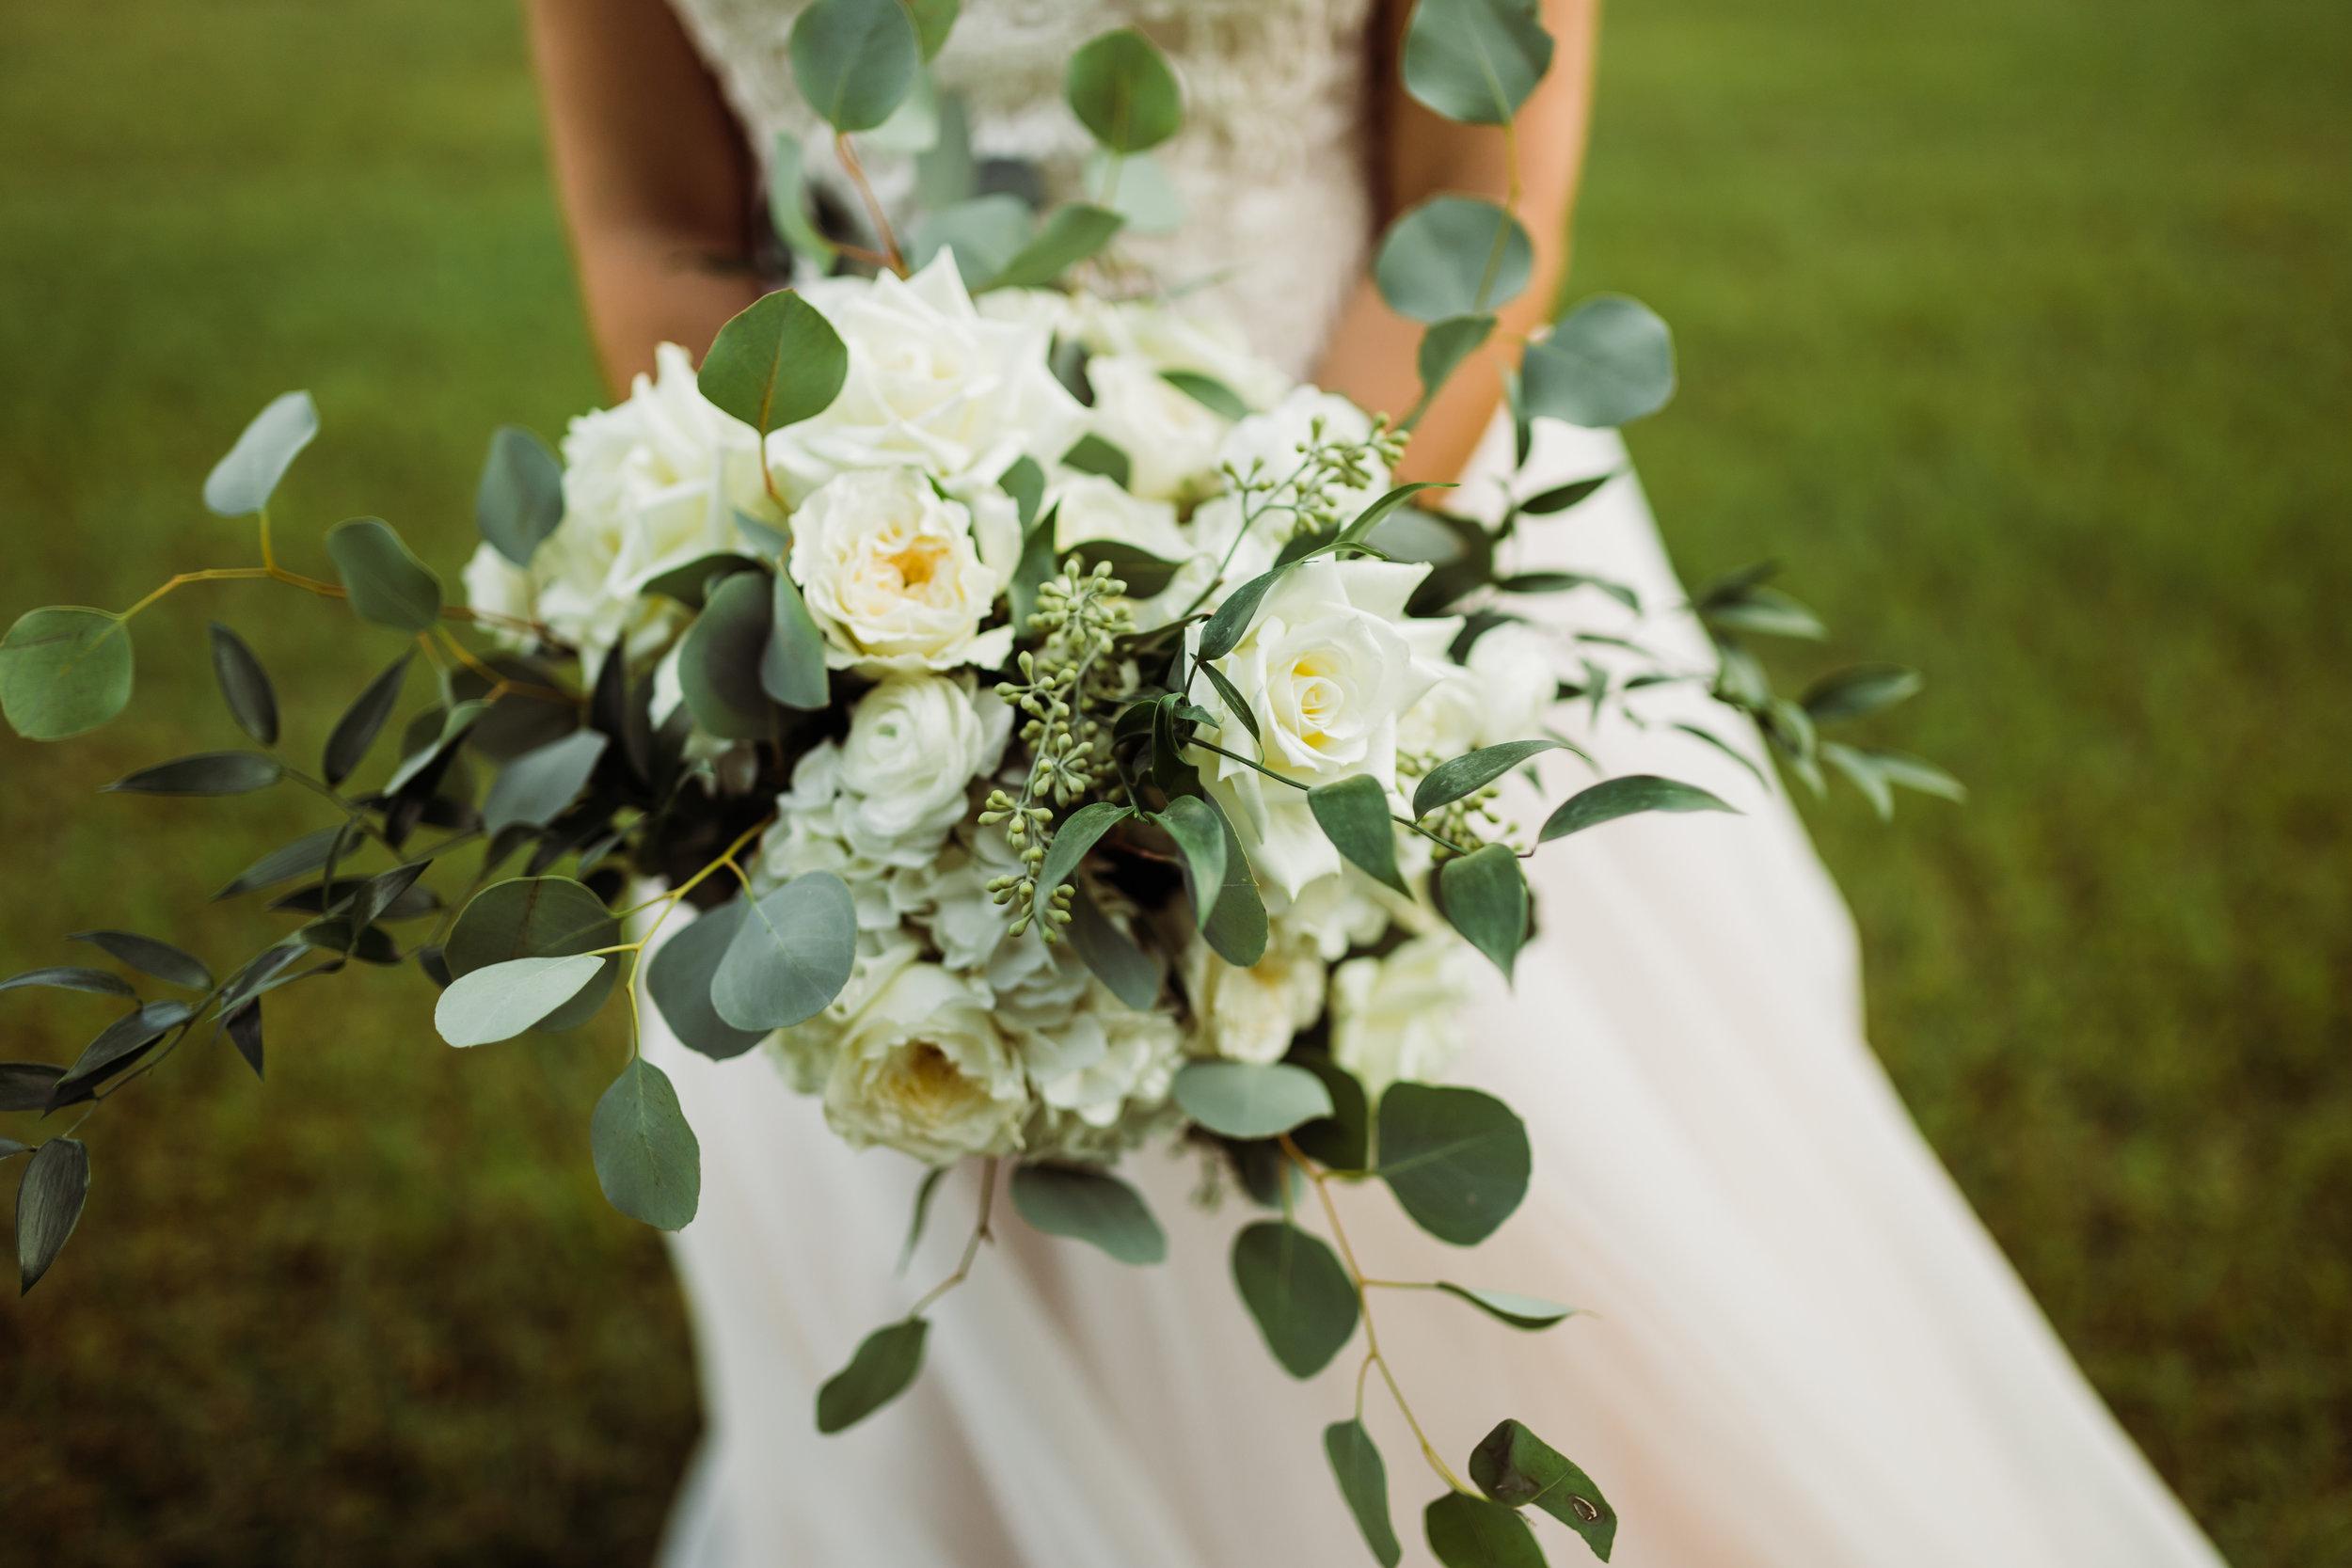 2017.10.14 Samantha and Matthew Crabtree Sarasota Wedding (230 of 708).jpg